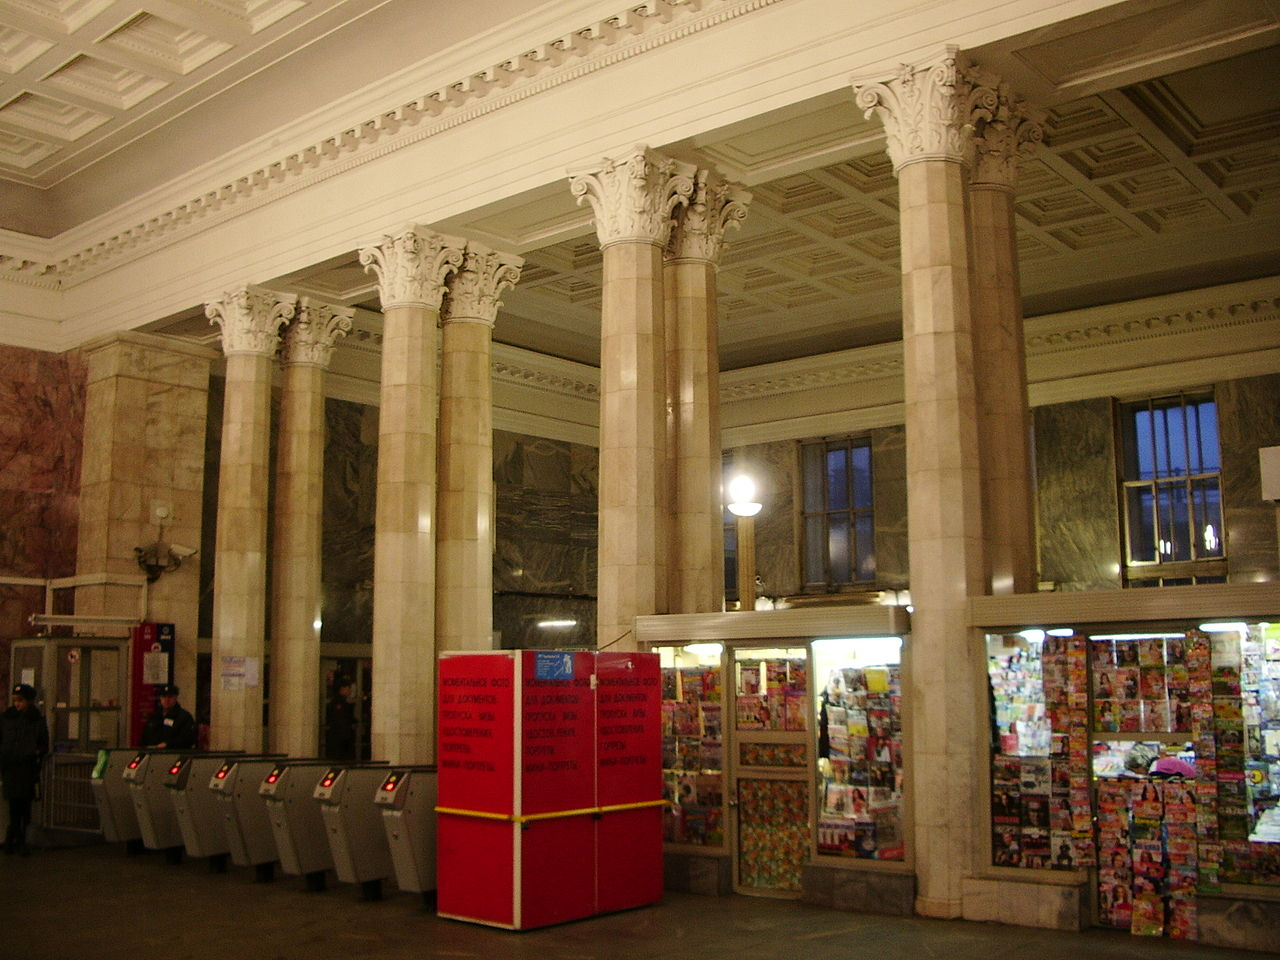 38x-Belorusskaya_metro_columns.JPG